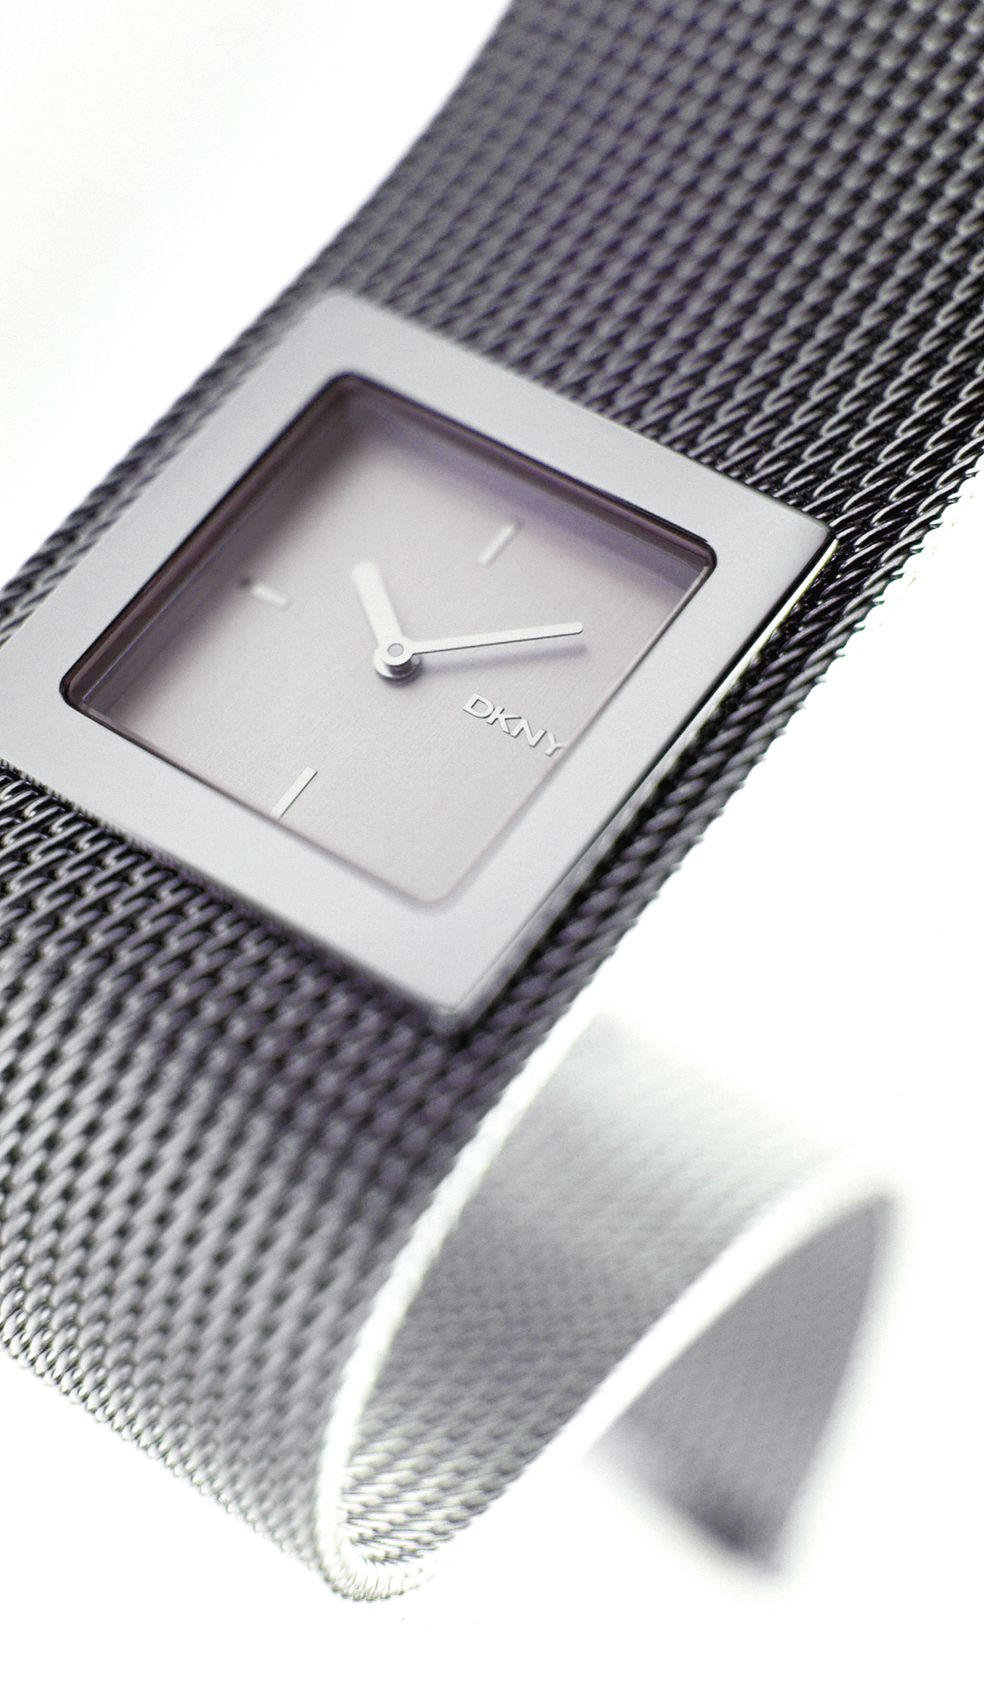 watch2 +10L.jpg